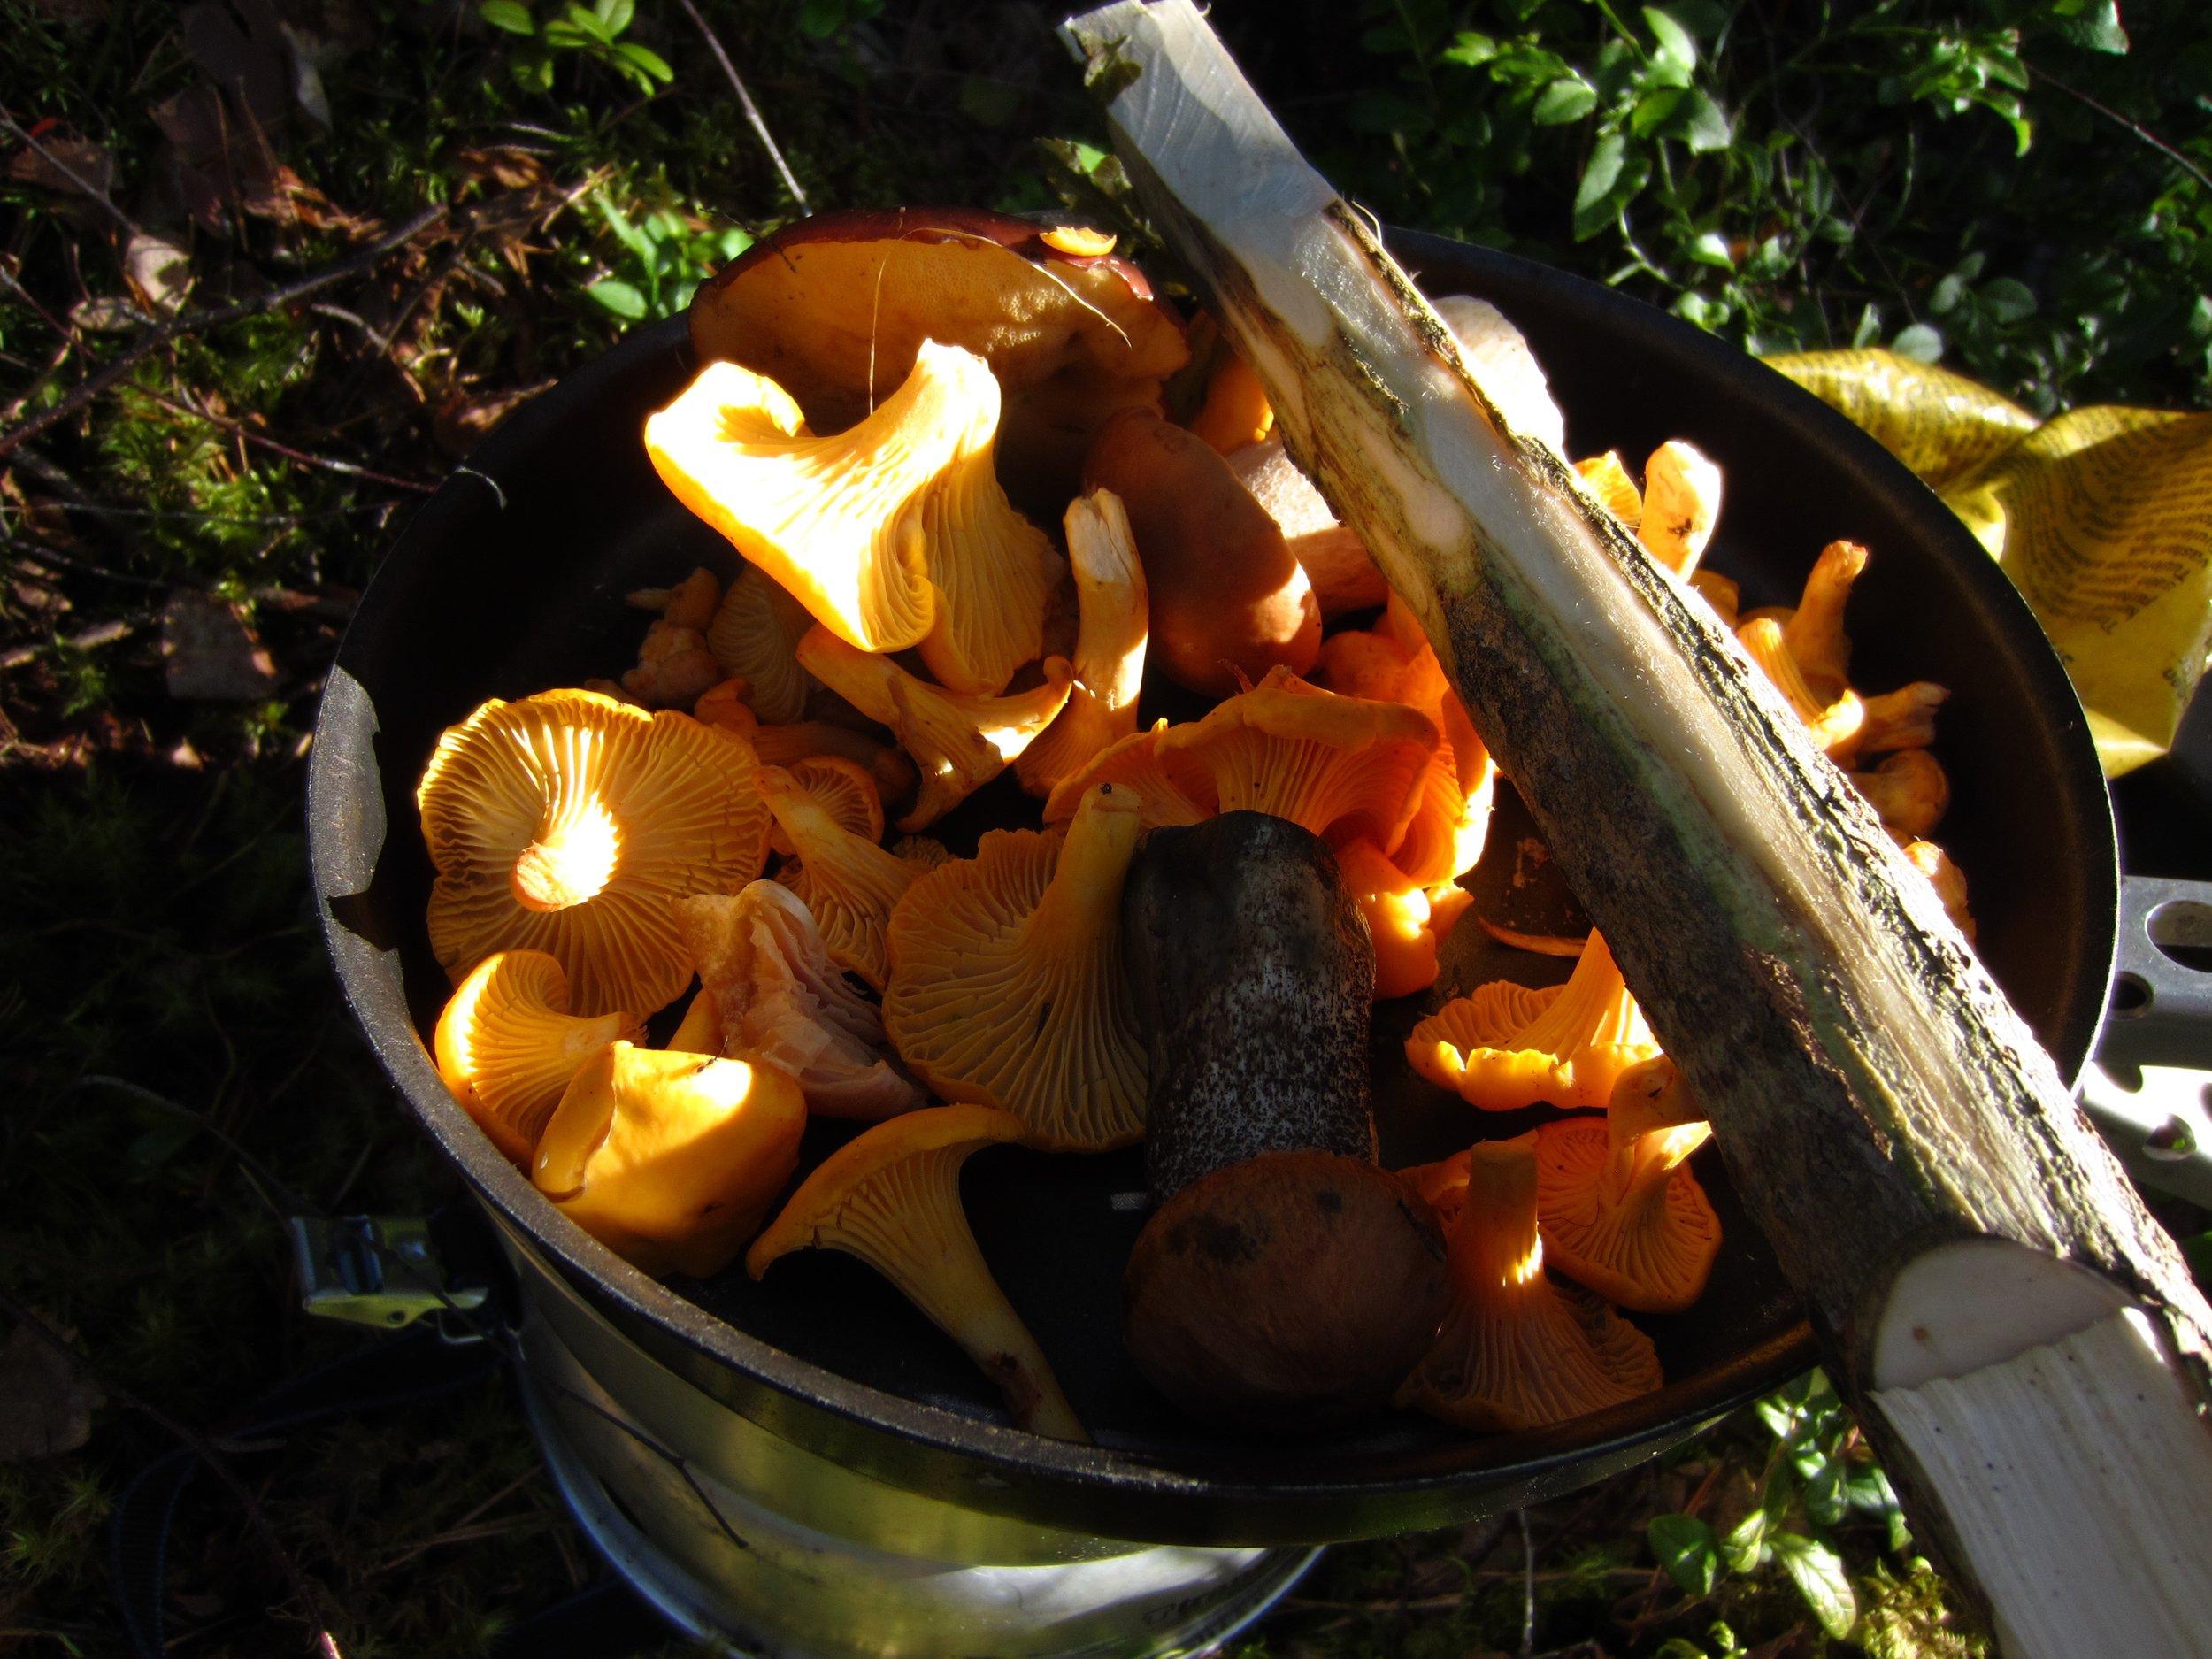 Chantarelle Mushroom picking trip in Nuuksio National Park